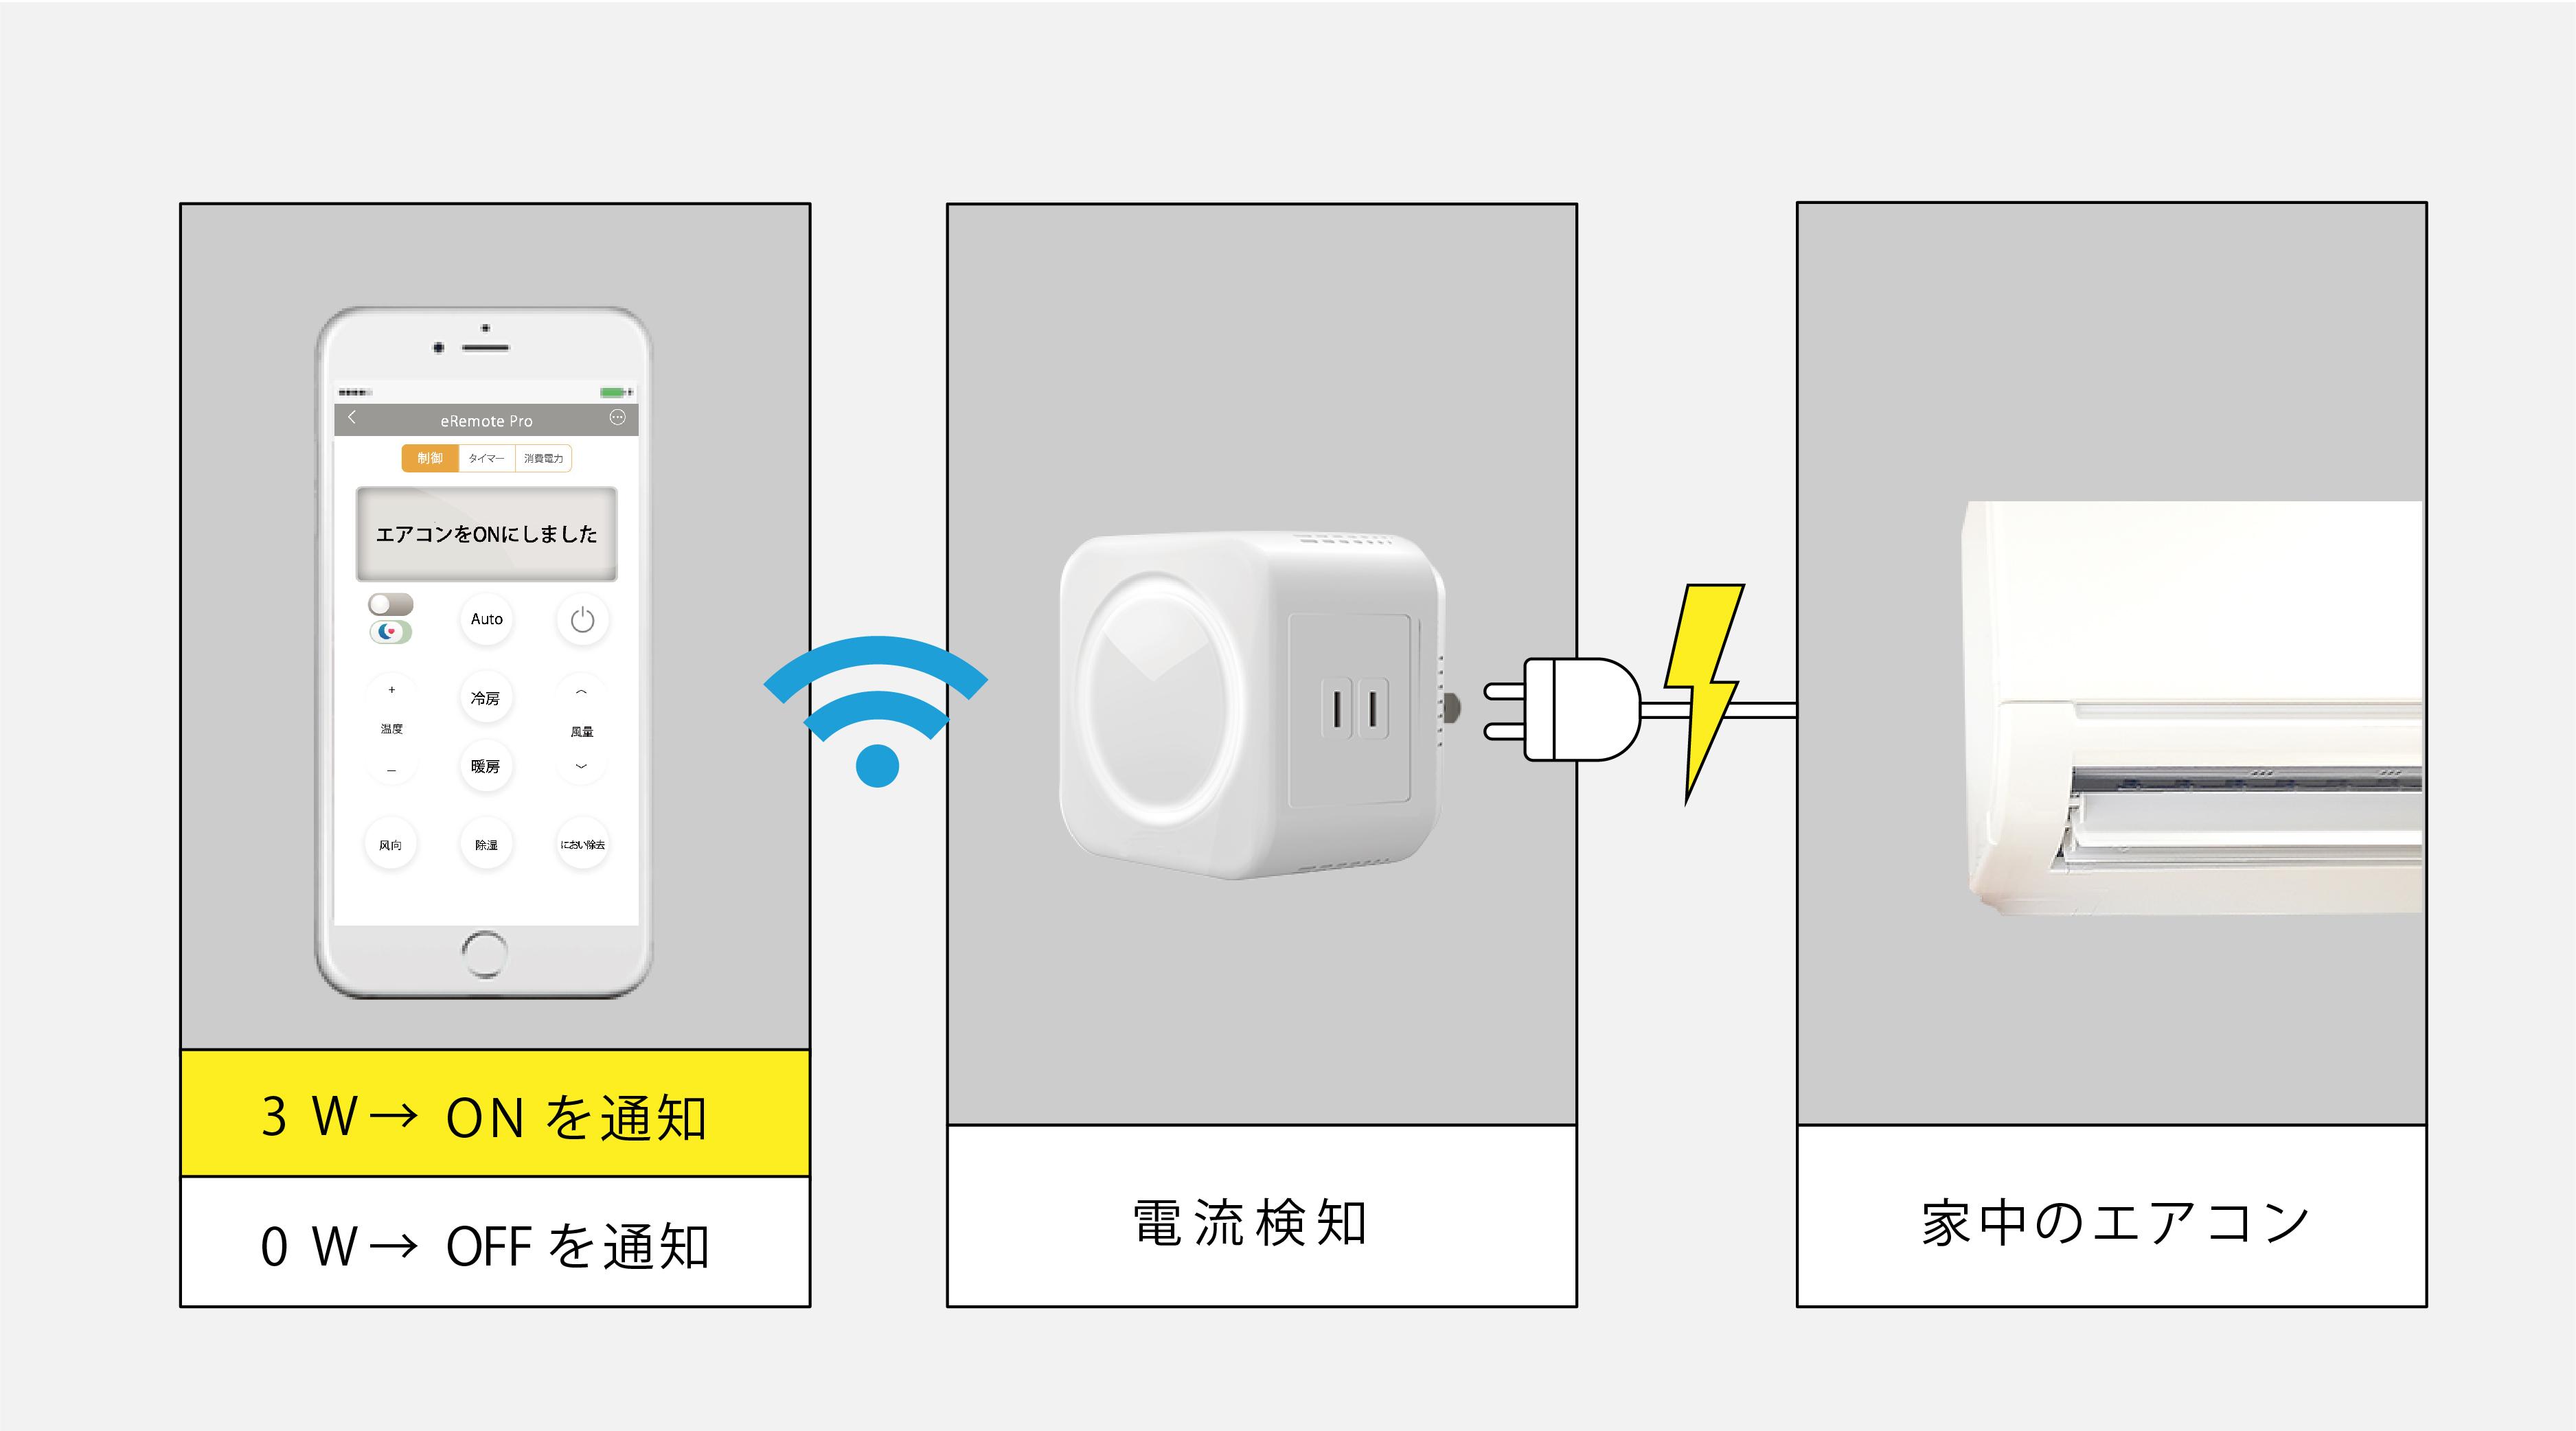 eRemote Pro|IoT 家電 スマートホーム・スマートハウス|Link Japan画像06